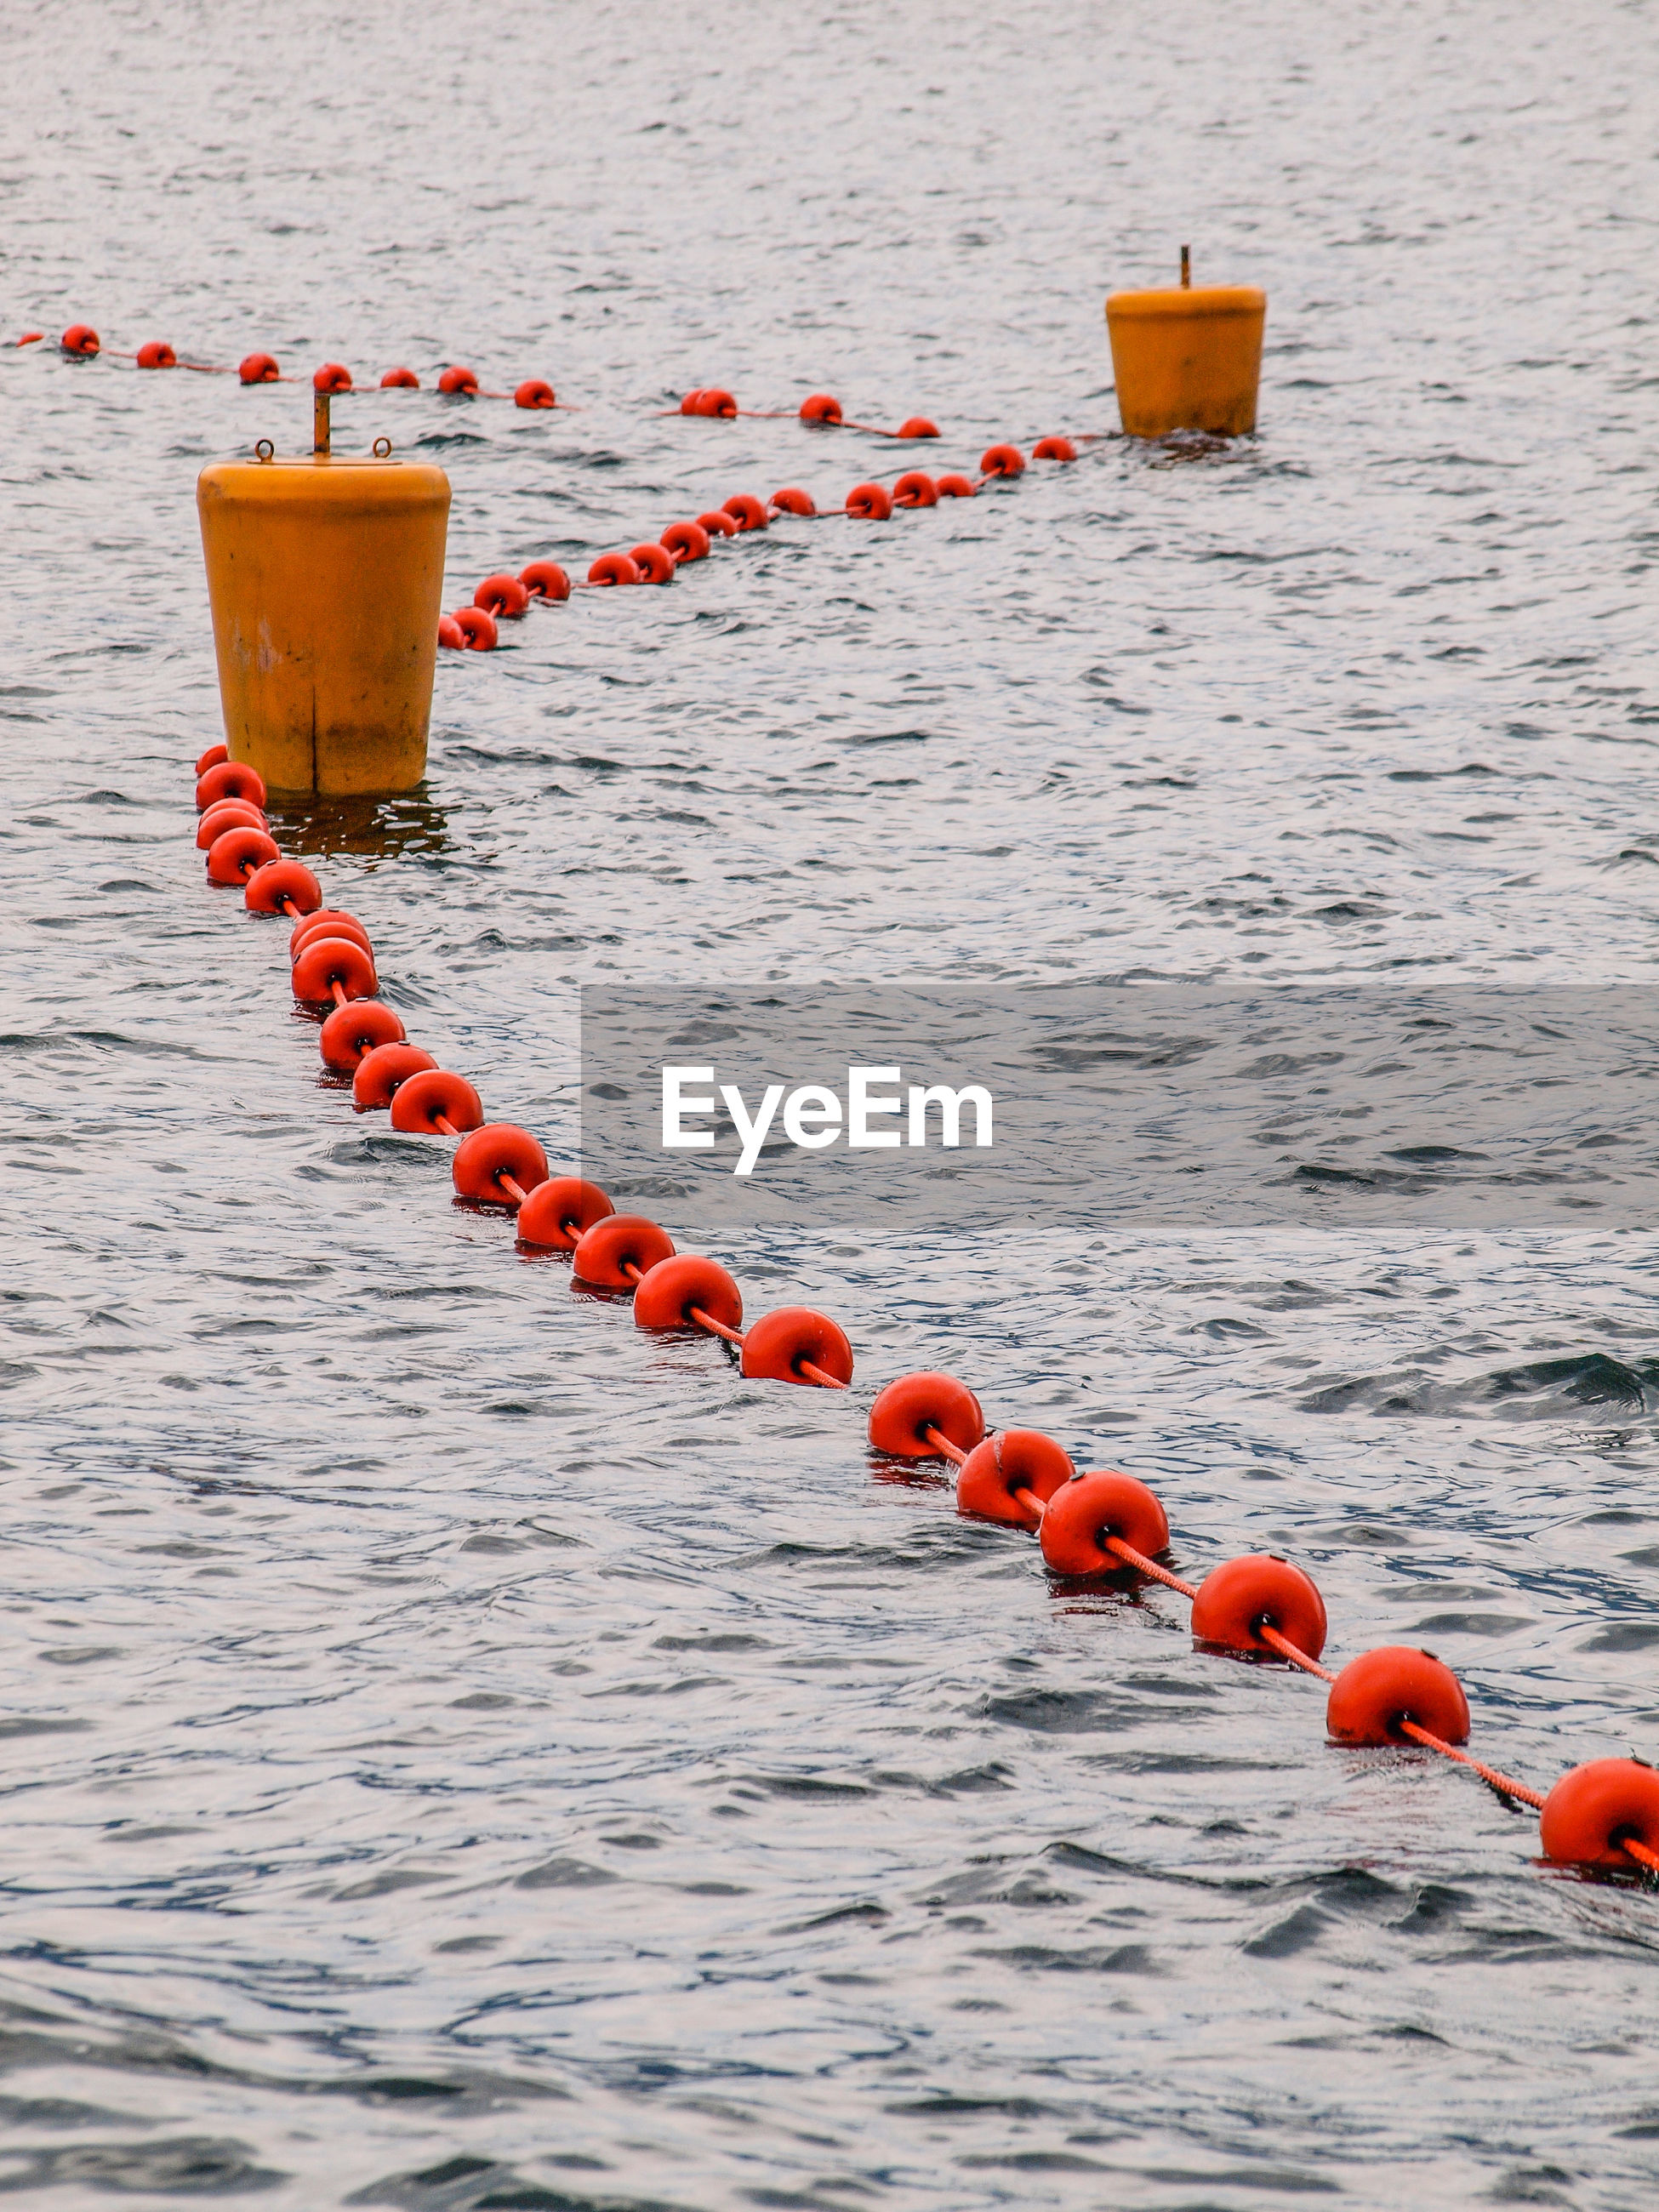 CLOSE-UP OF METALLIC FLOATING ON SEA